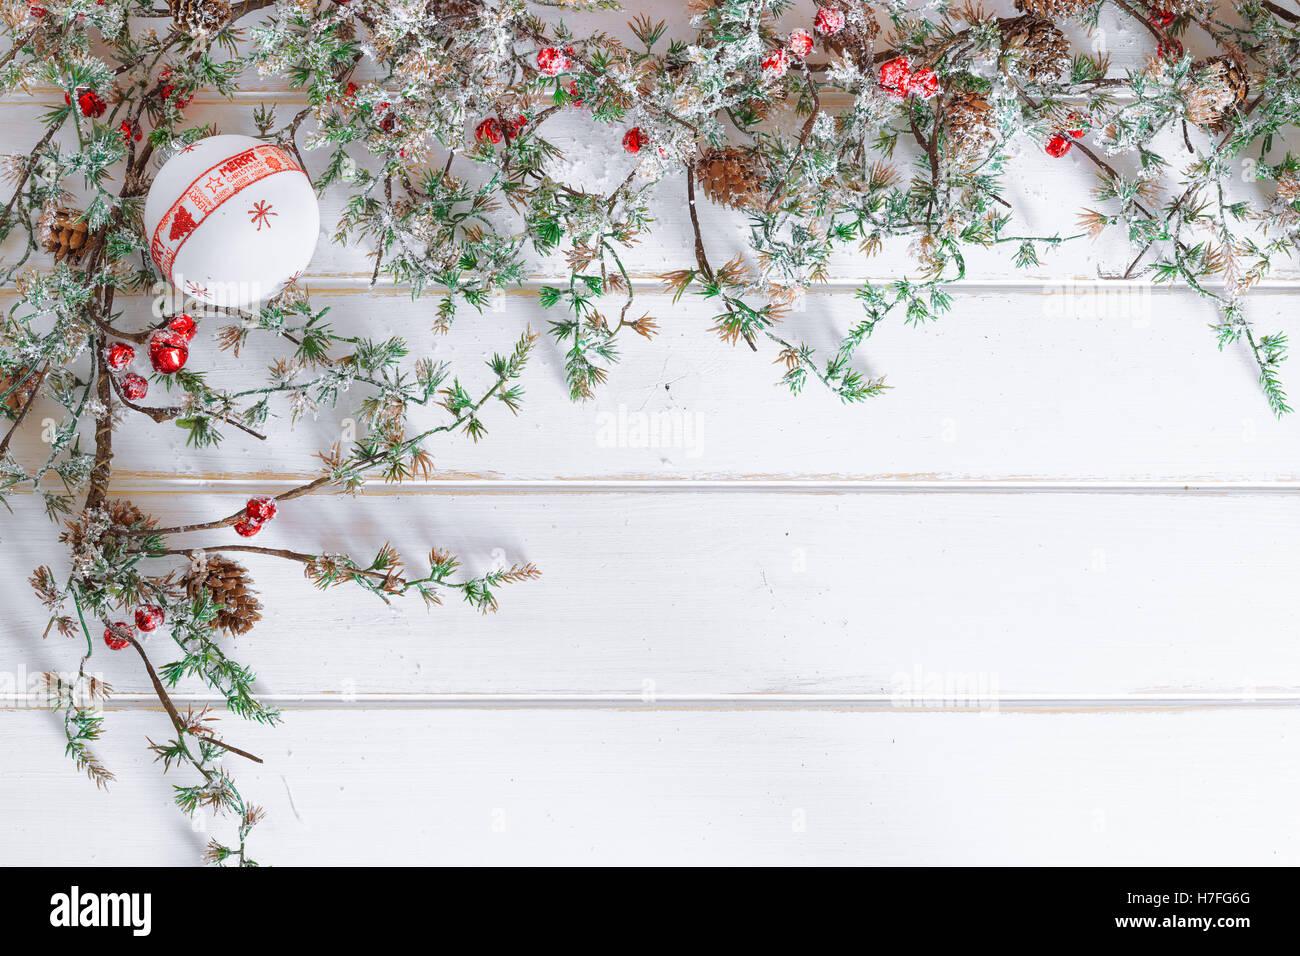 Christmas Border Design Snow Covered Stock Photos